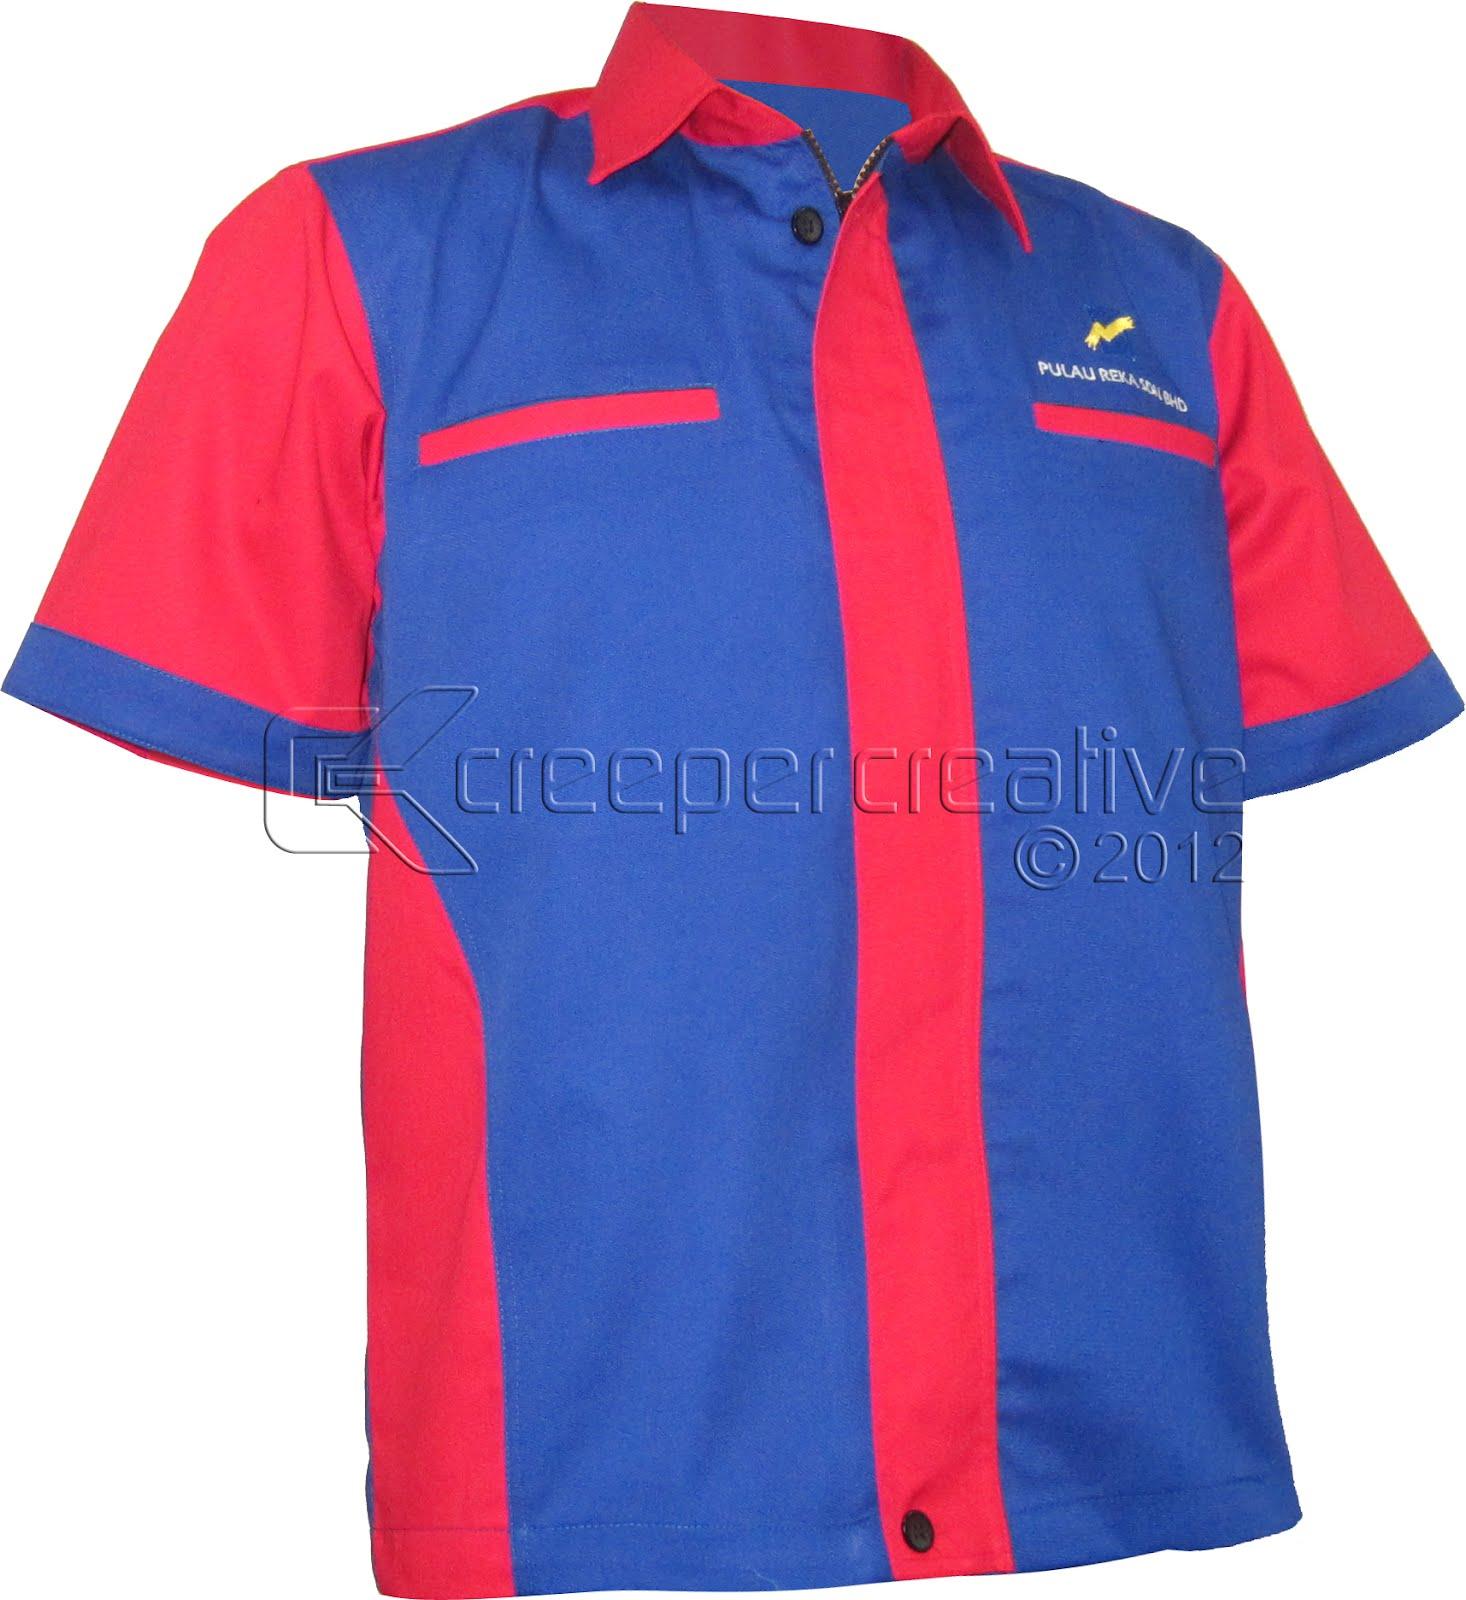 Shirt jacket design -  Baju F1 Baju Korporat F1 Uniform Corporate Uniform Uniform F1 Shirt Lady S Cutting F1 Shirt Design Kemeja F1 Terkini Corporate Shirt Design